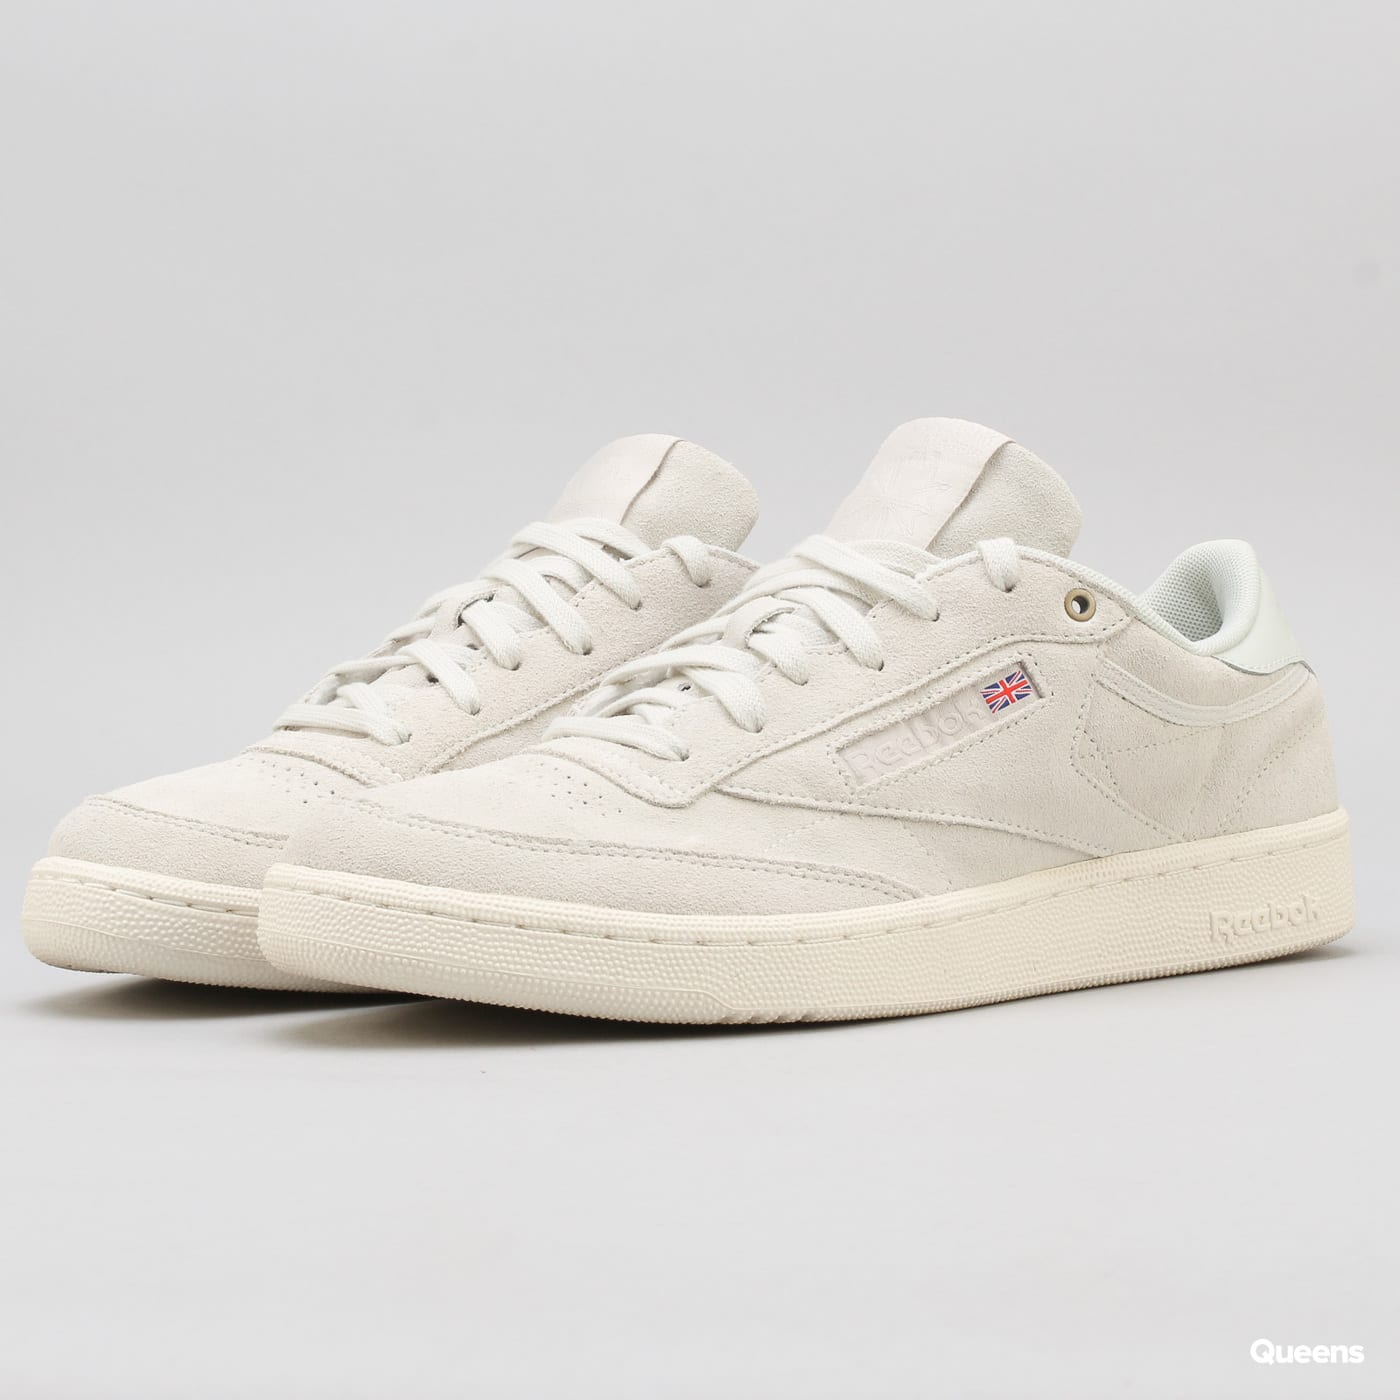 61fe905f076dd Sneakers Reebok Club C 85 MCC (CM9296)– Queens 💚